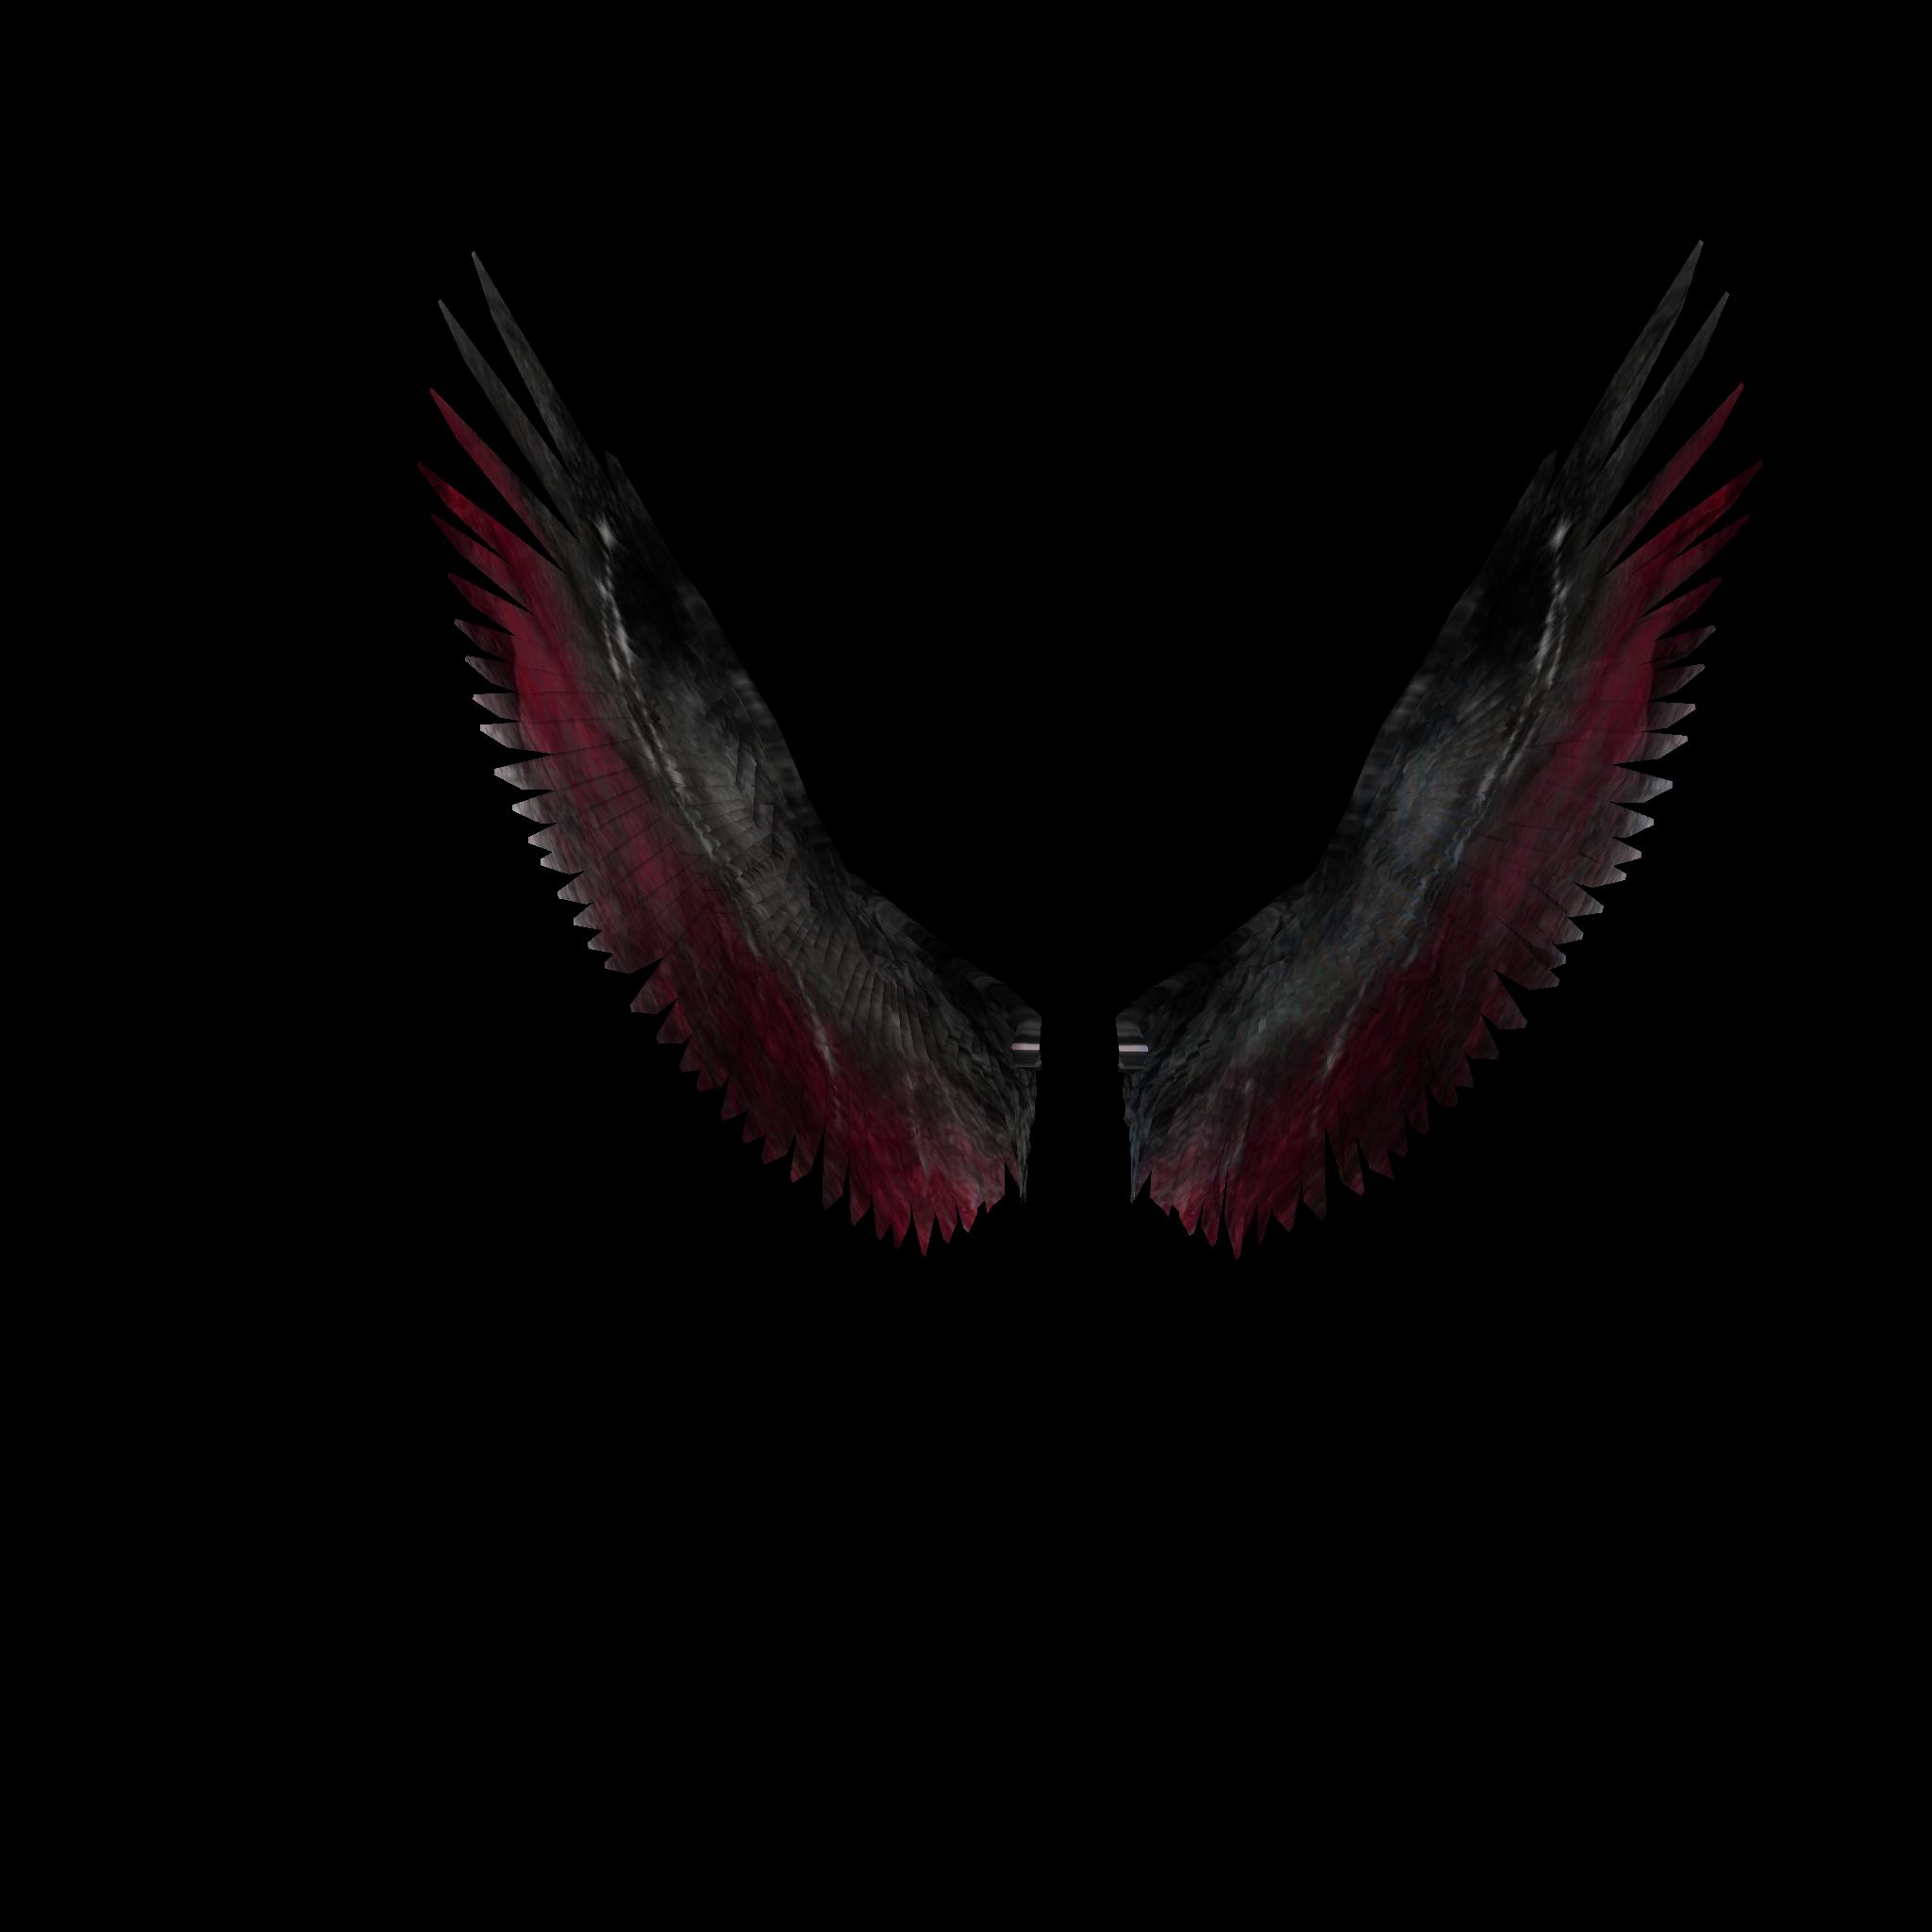 Halo clipart dark angel Bay Wings Clipart Fallen Clipart